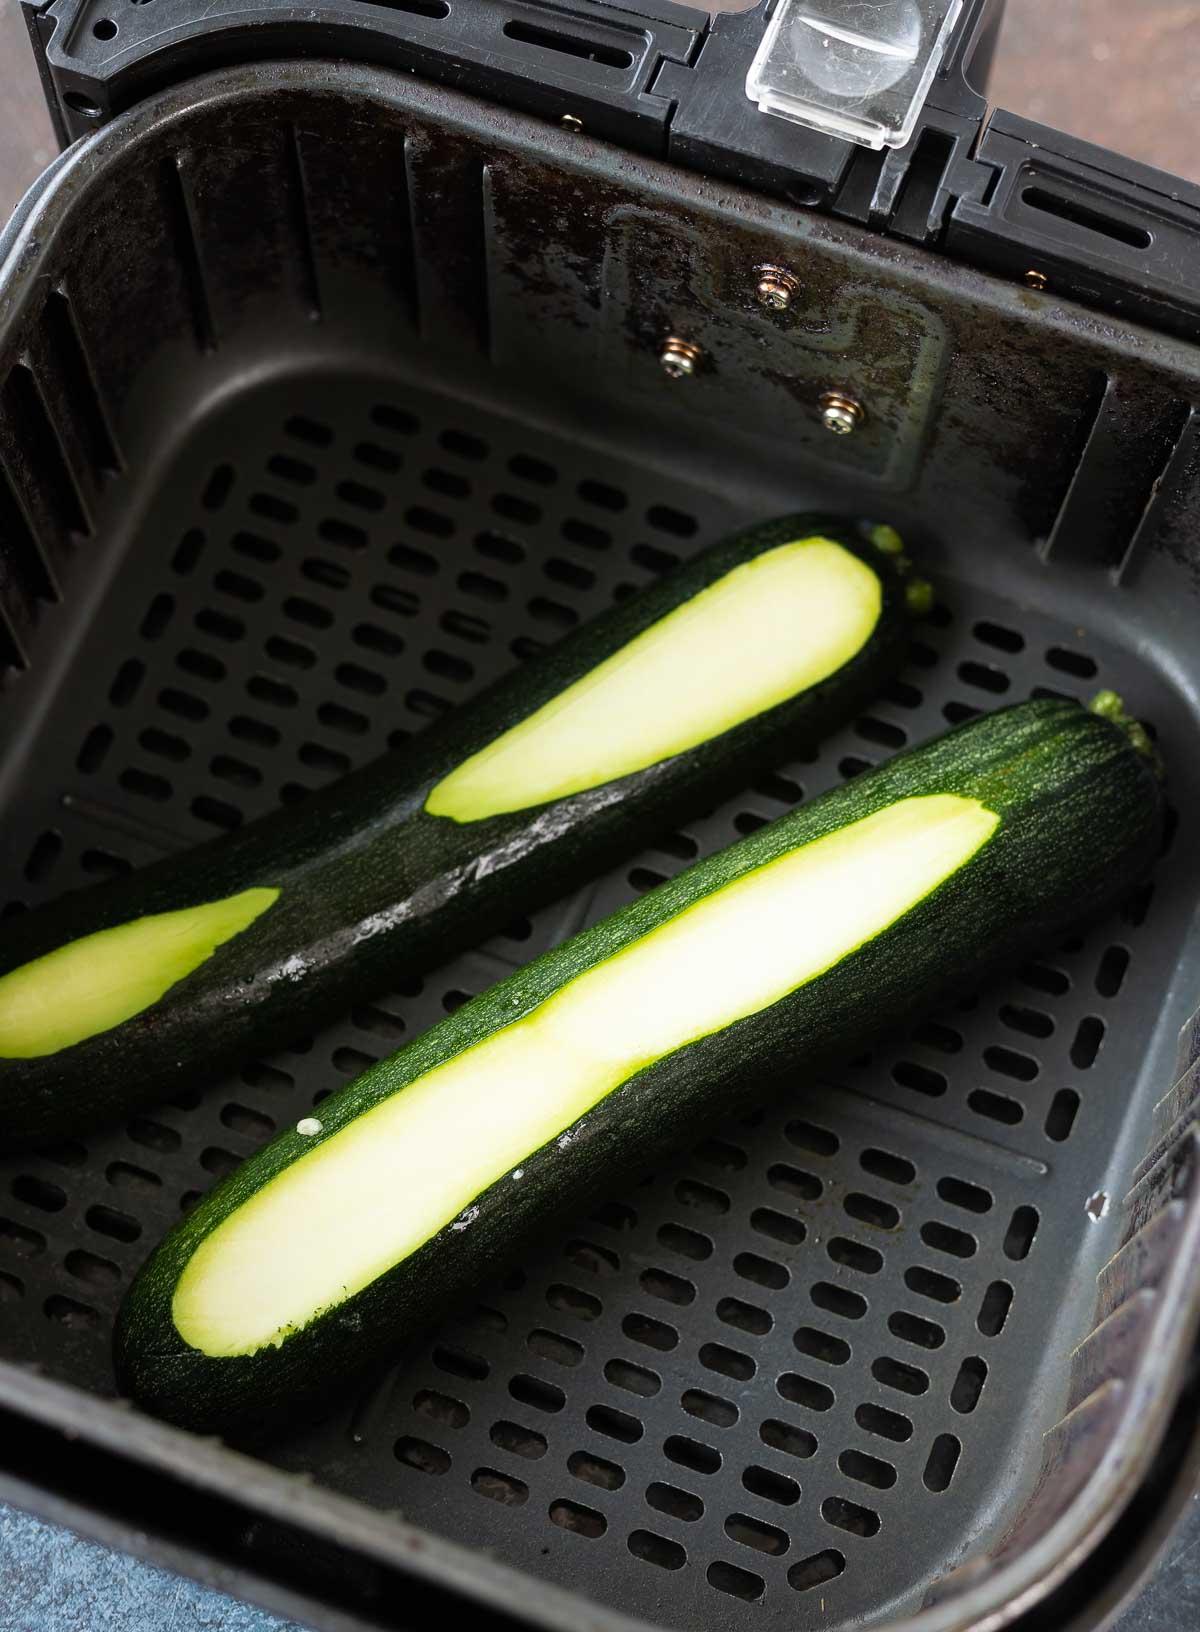 raw zucchini in air fryer basket